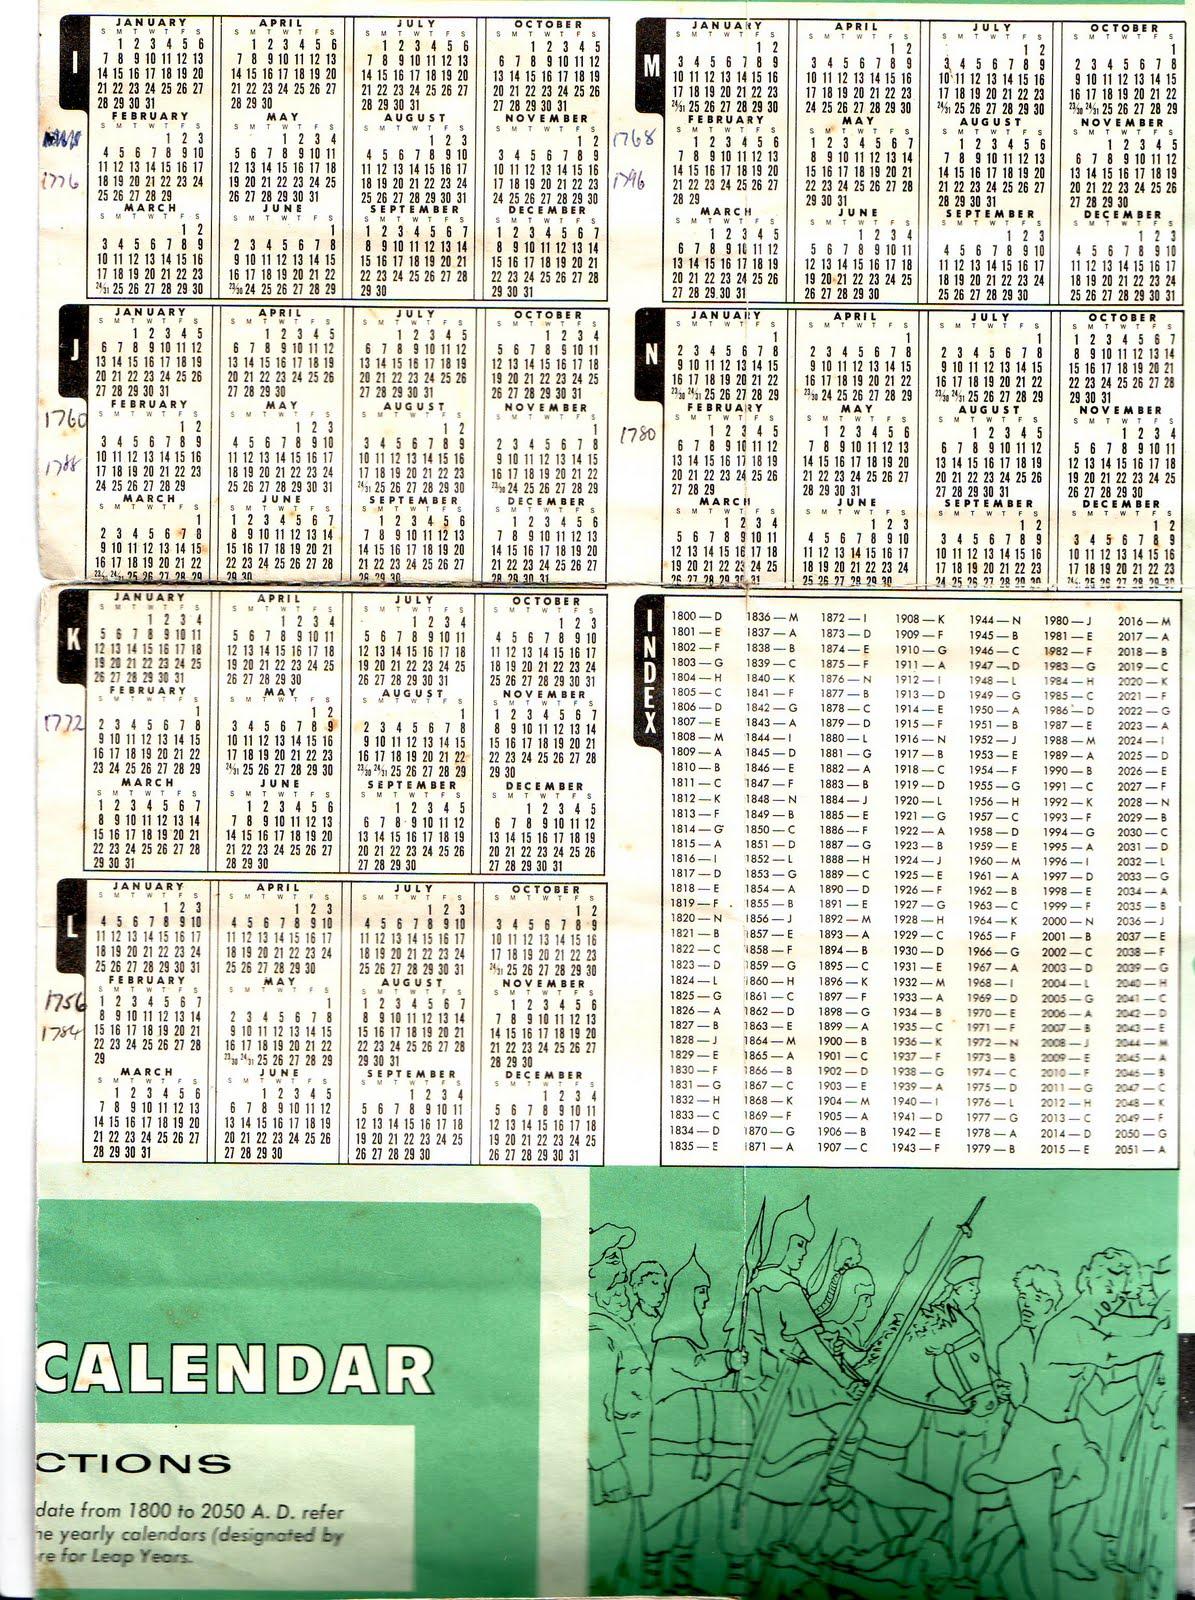 Perpetual Calendar 1800 To 2050 : Purse caundle history appendices purse caundle history year